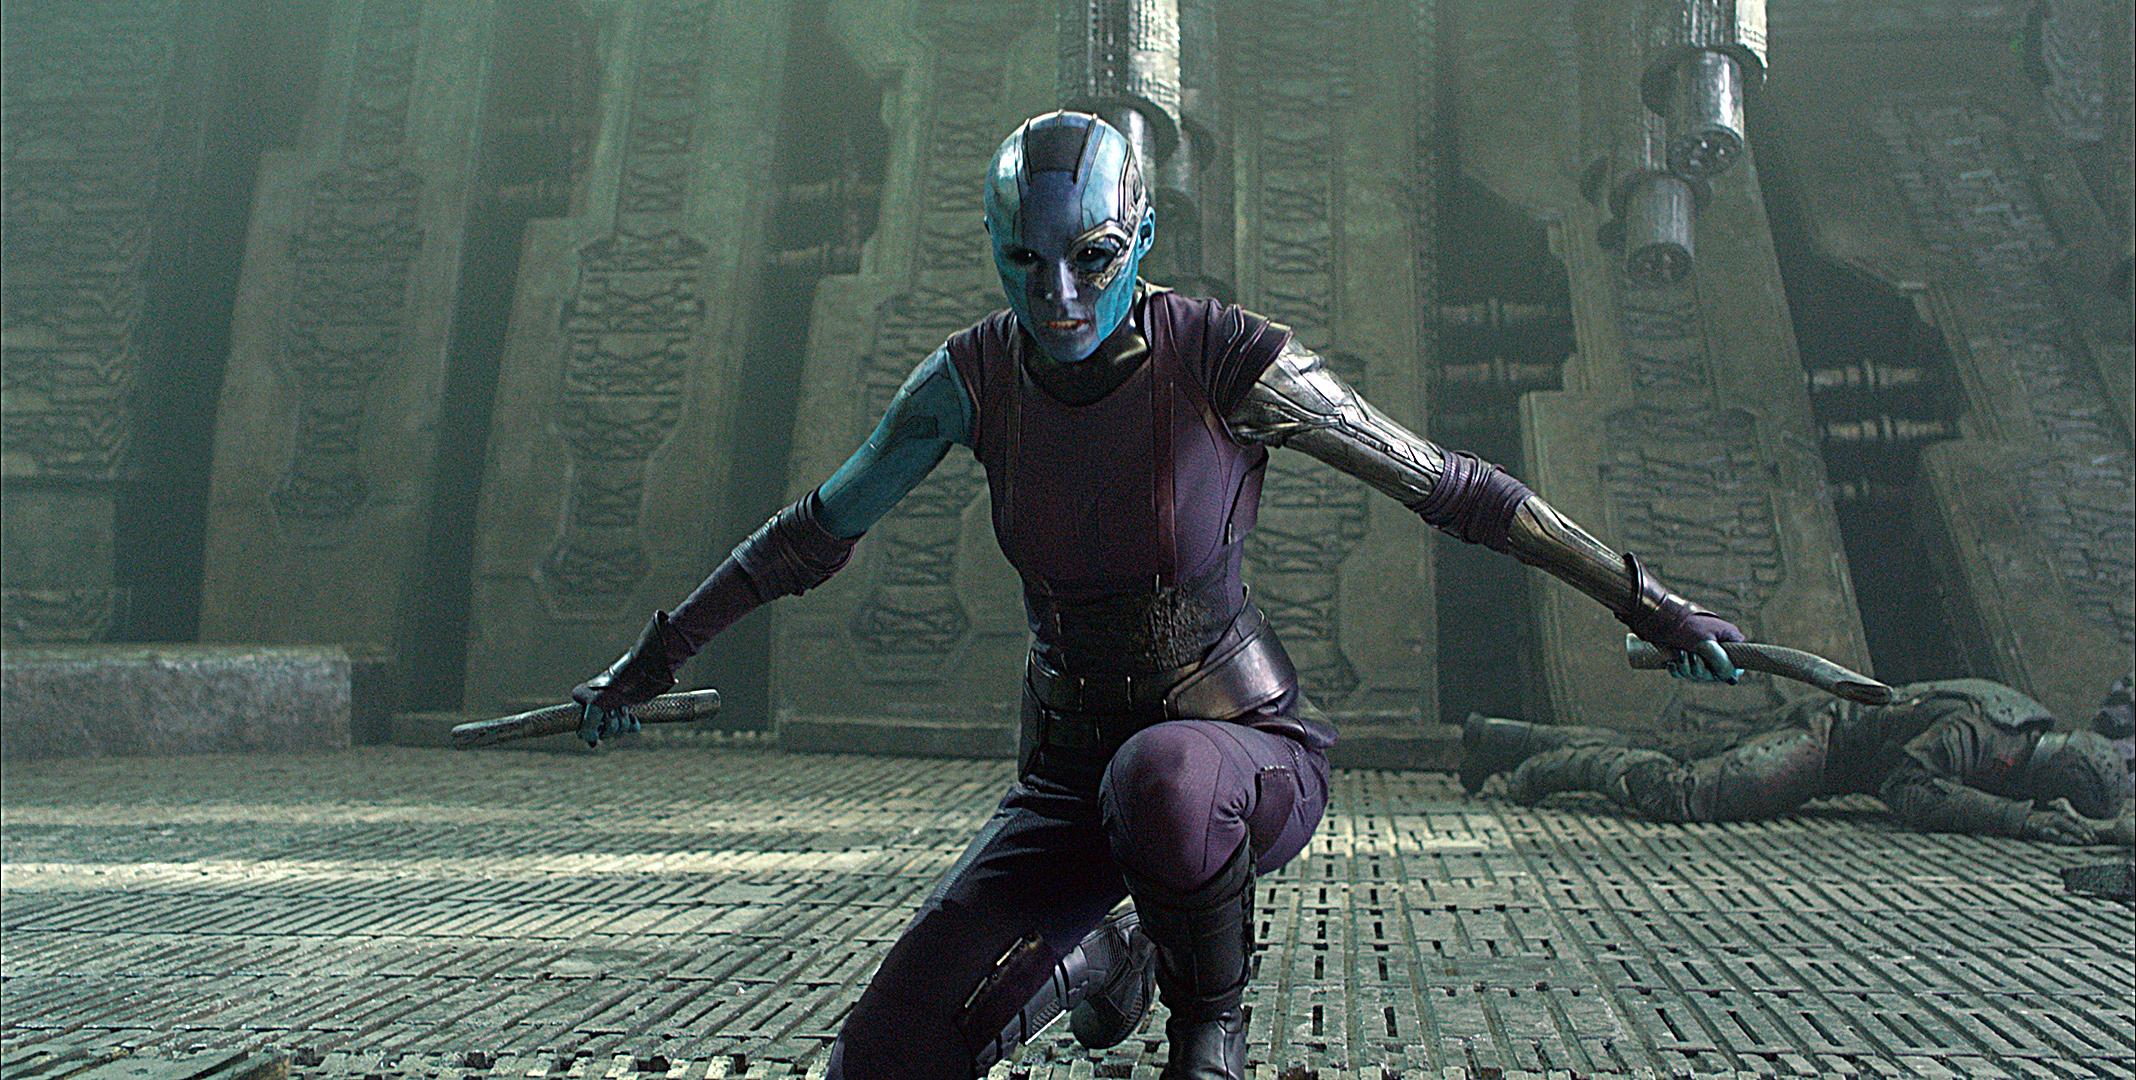 Karen Gillan confirma la aparición de Nebula en Avengers: Infinity War